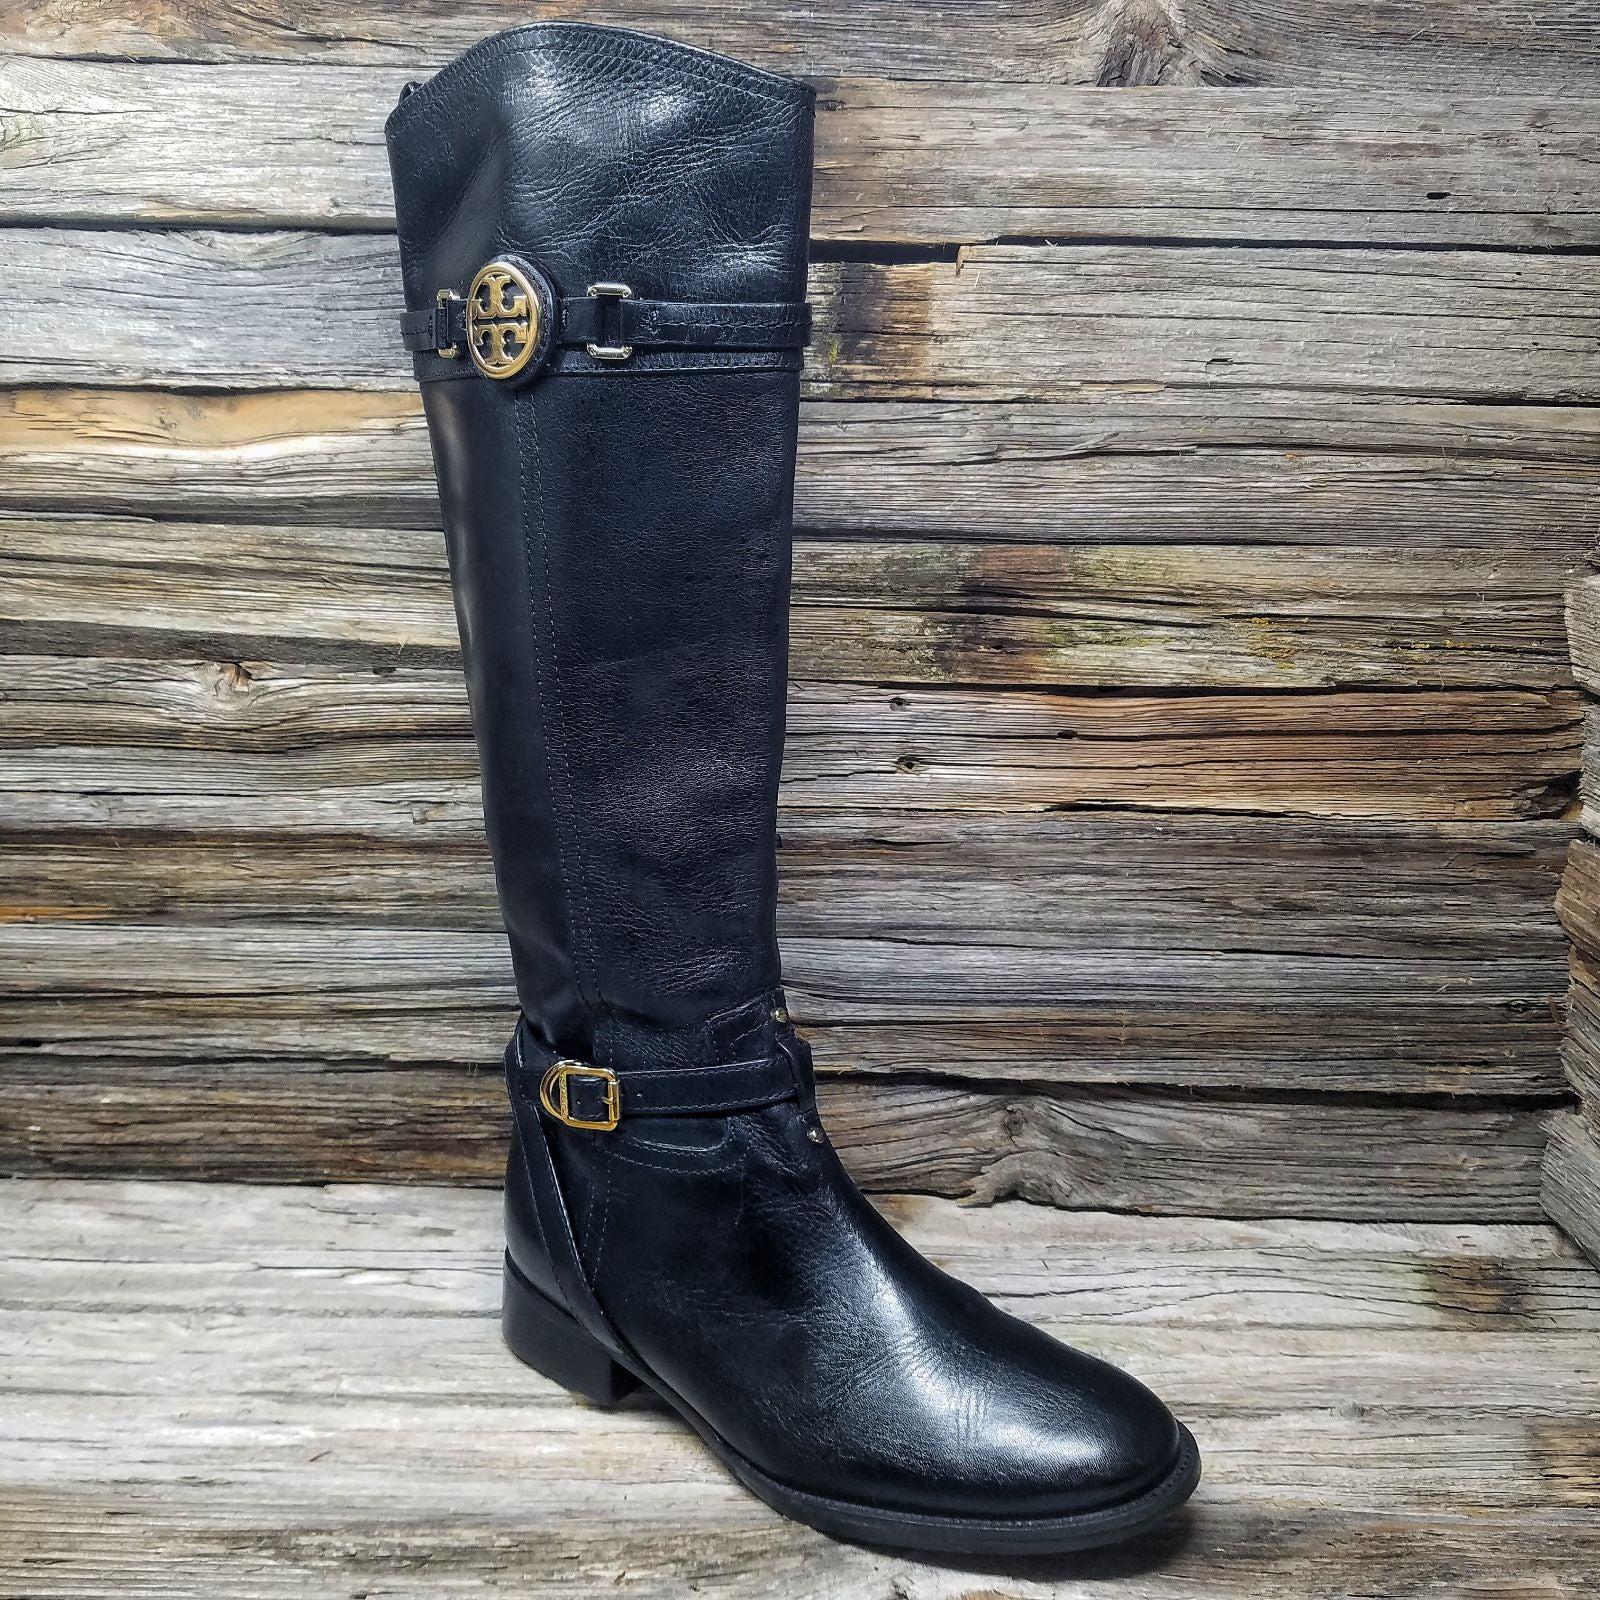 Tori Burch Calista Black Leather Boots